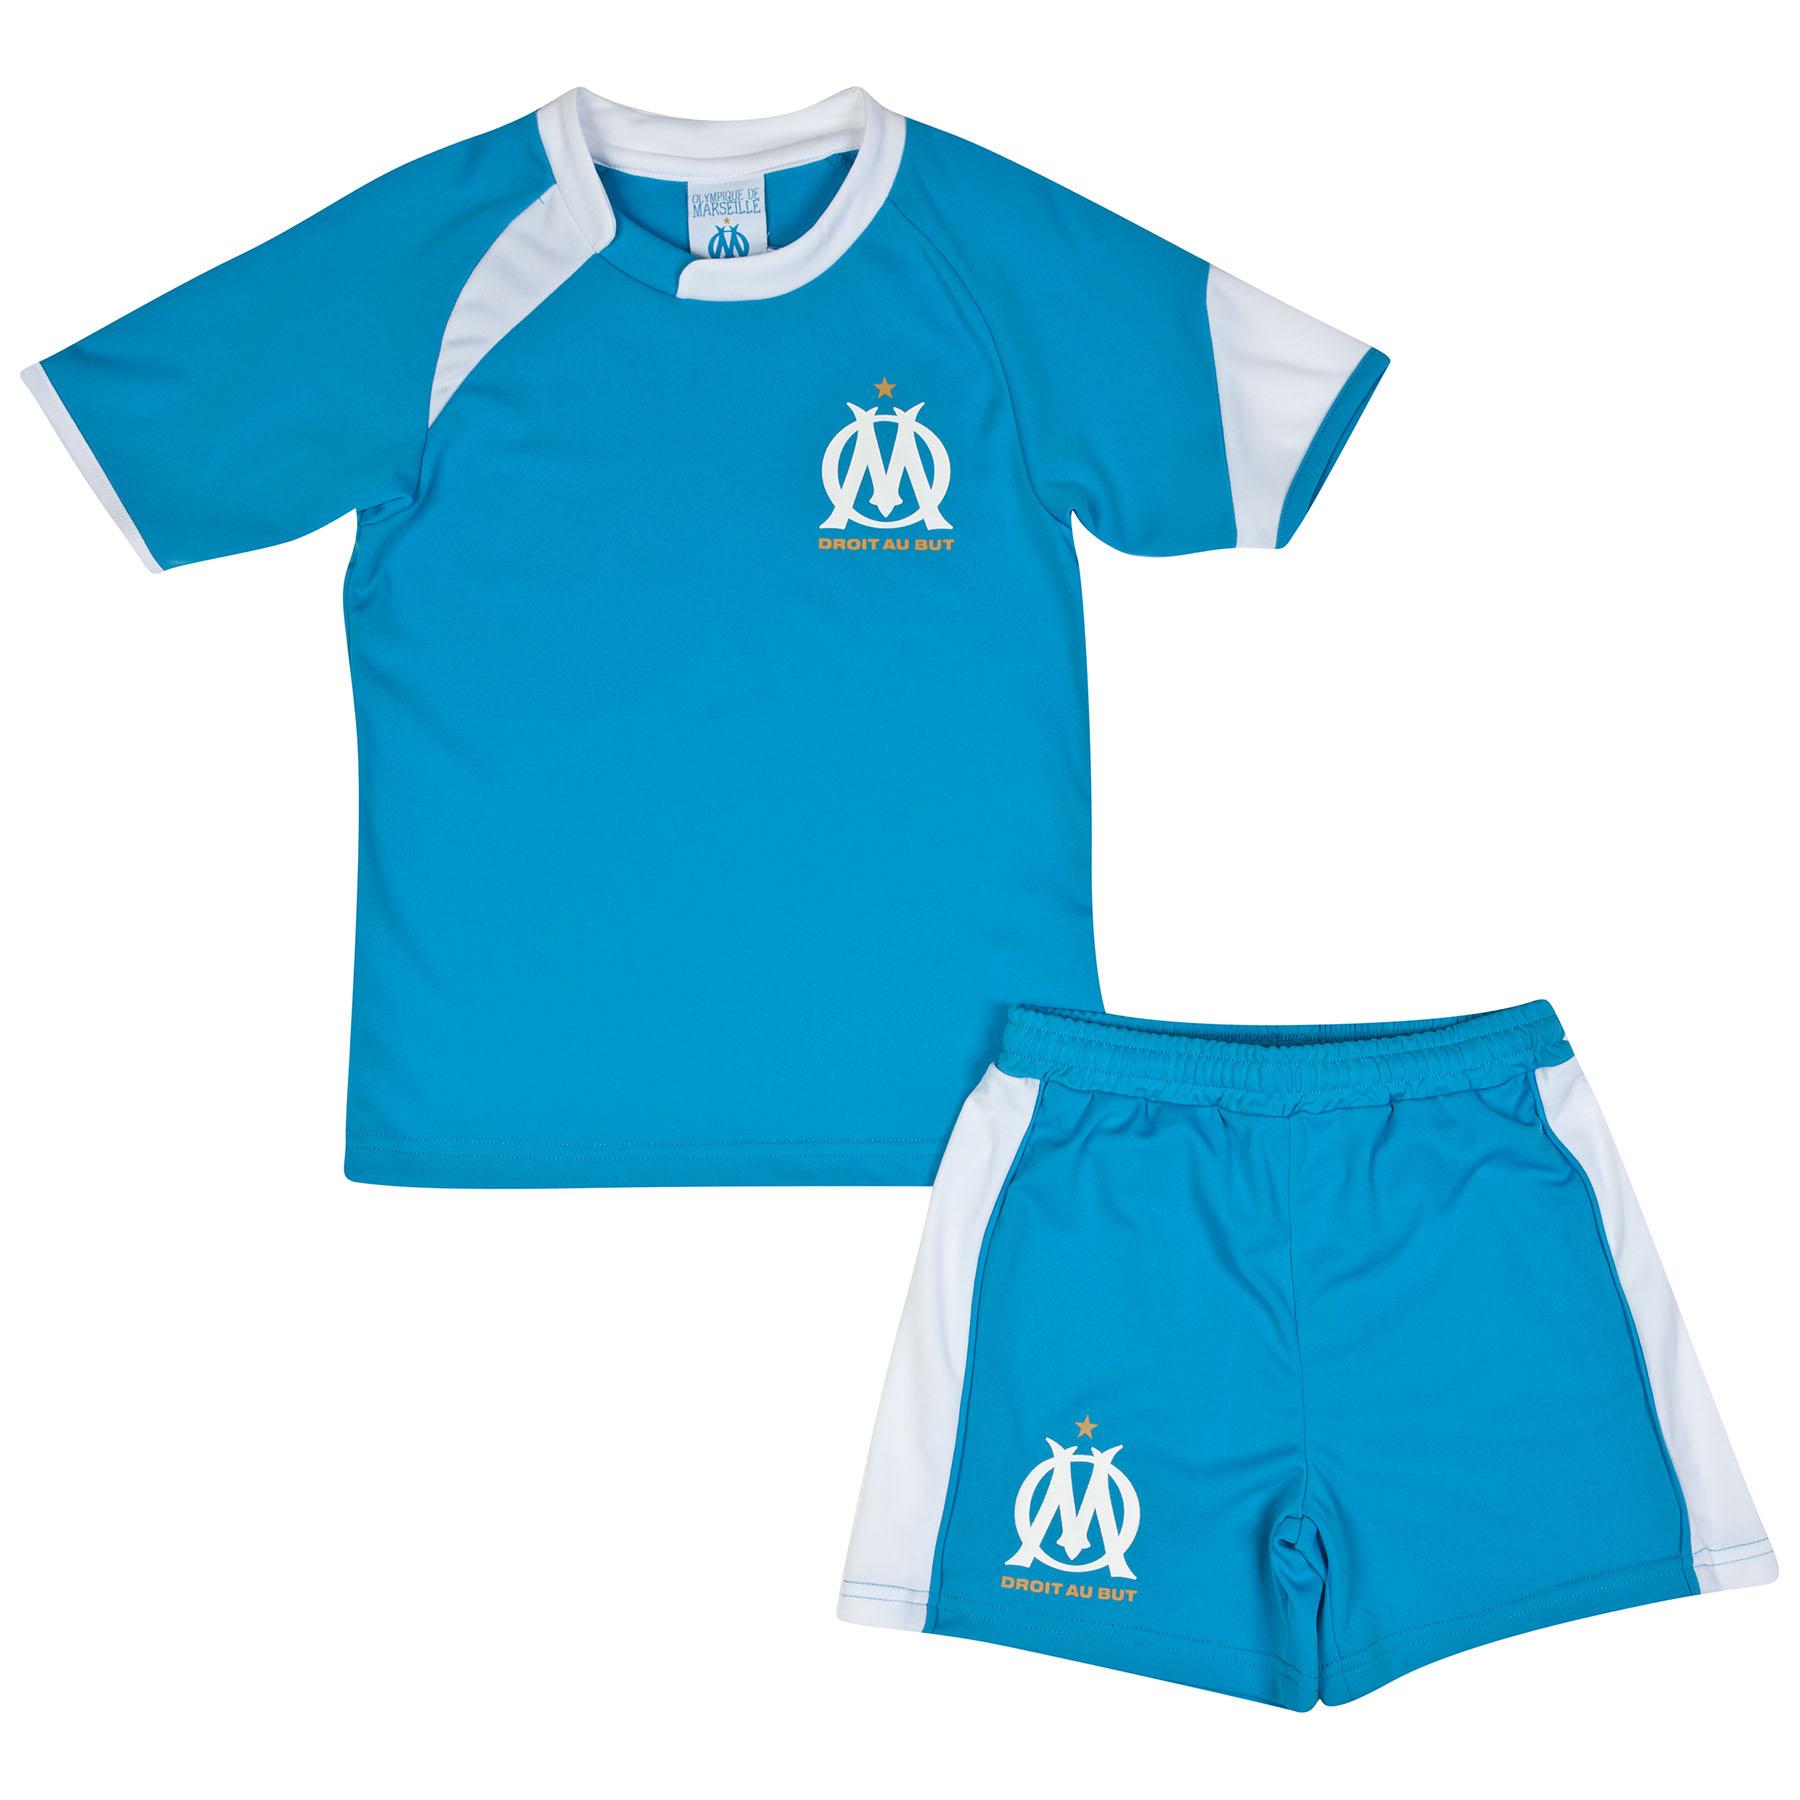 Olympique de Marseille Fan Mini Kit - Blue - Boys